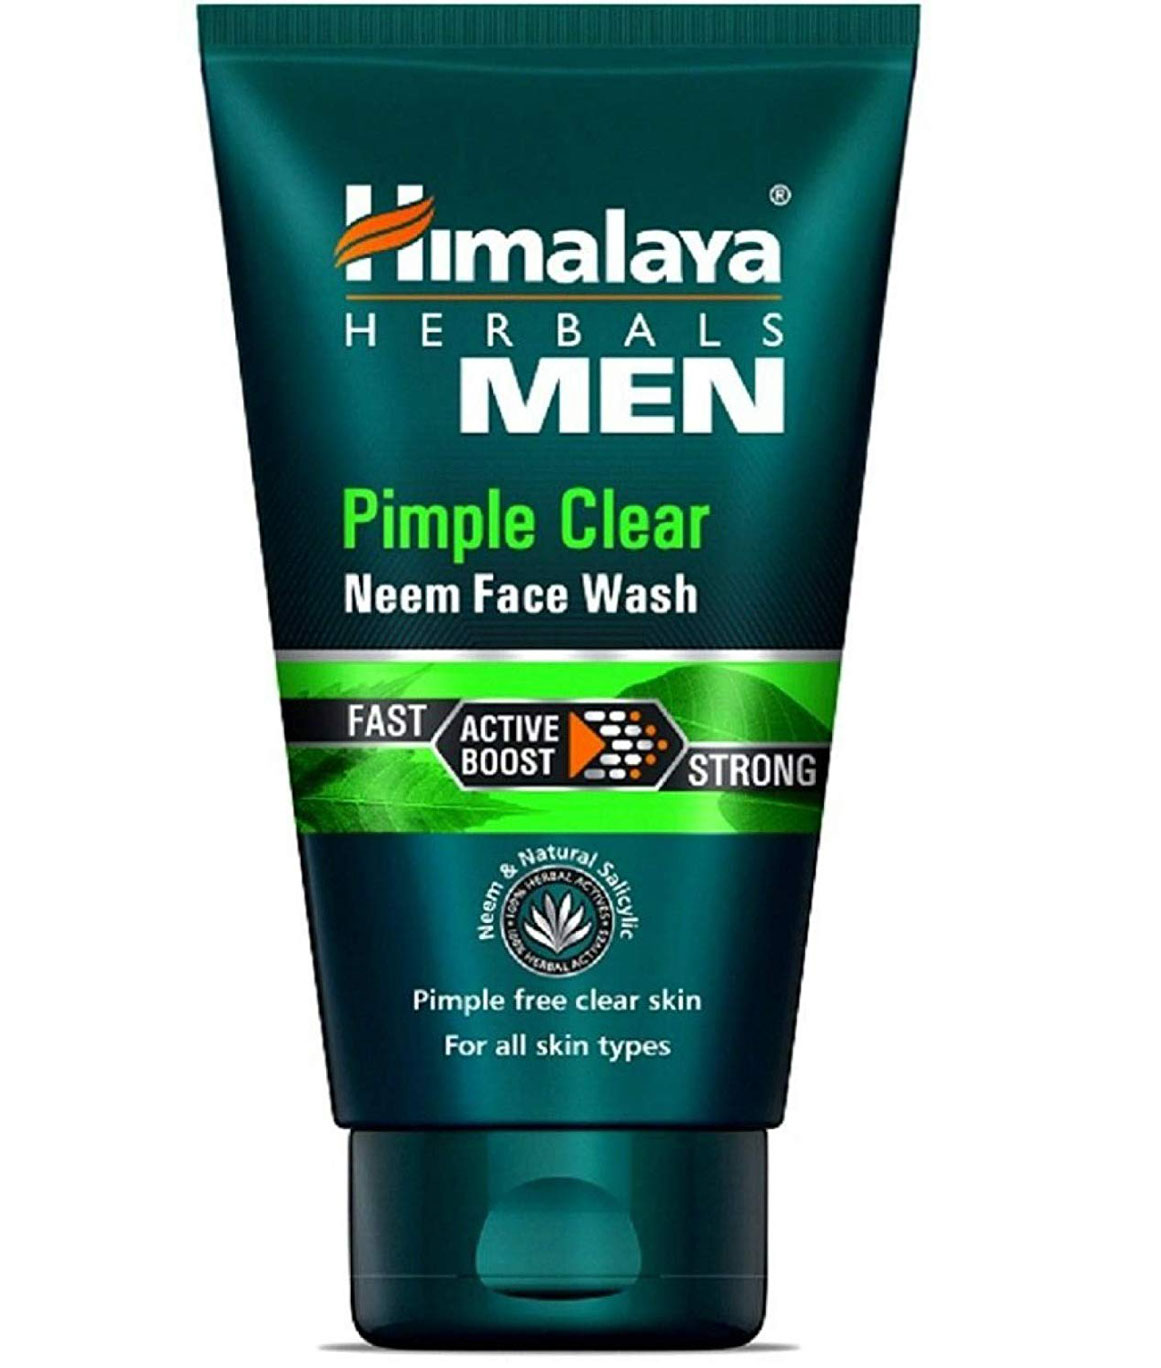 Himalaya pimple clear men neem face wash gel 100ml